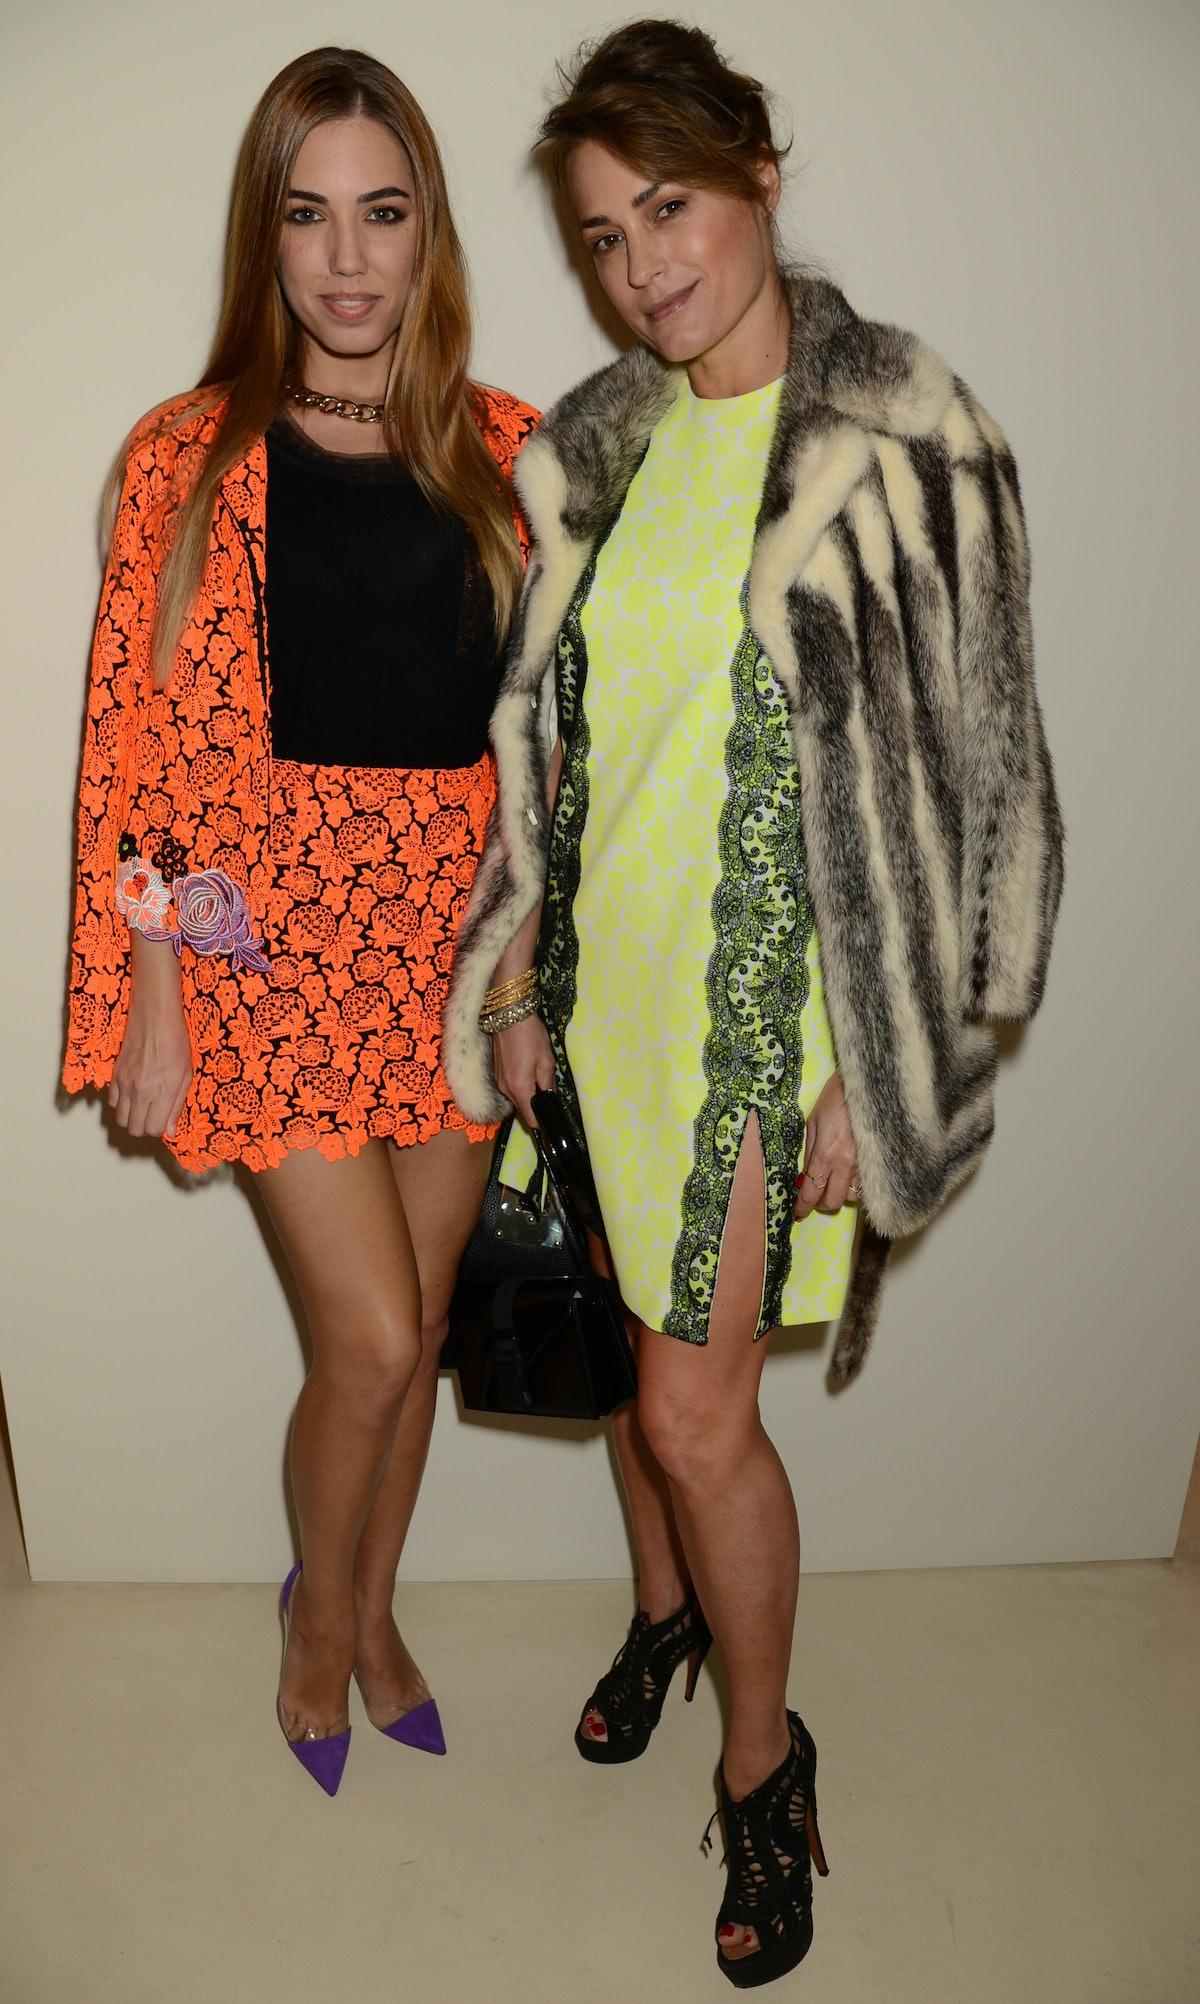 Amber and Yasmin Le Bon